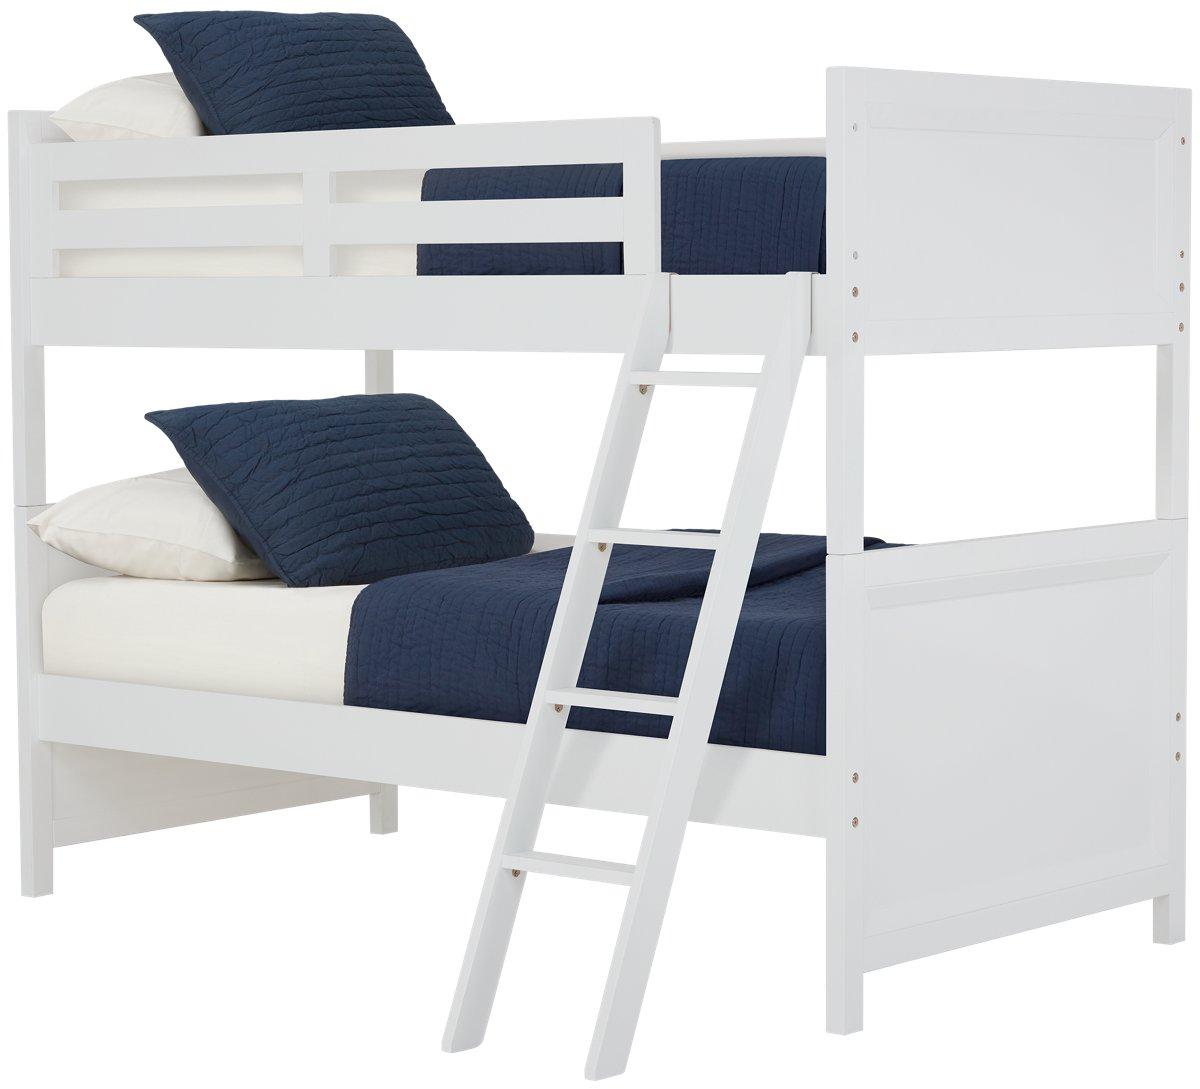 Ryder White Wood Bunk Bed